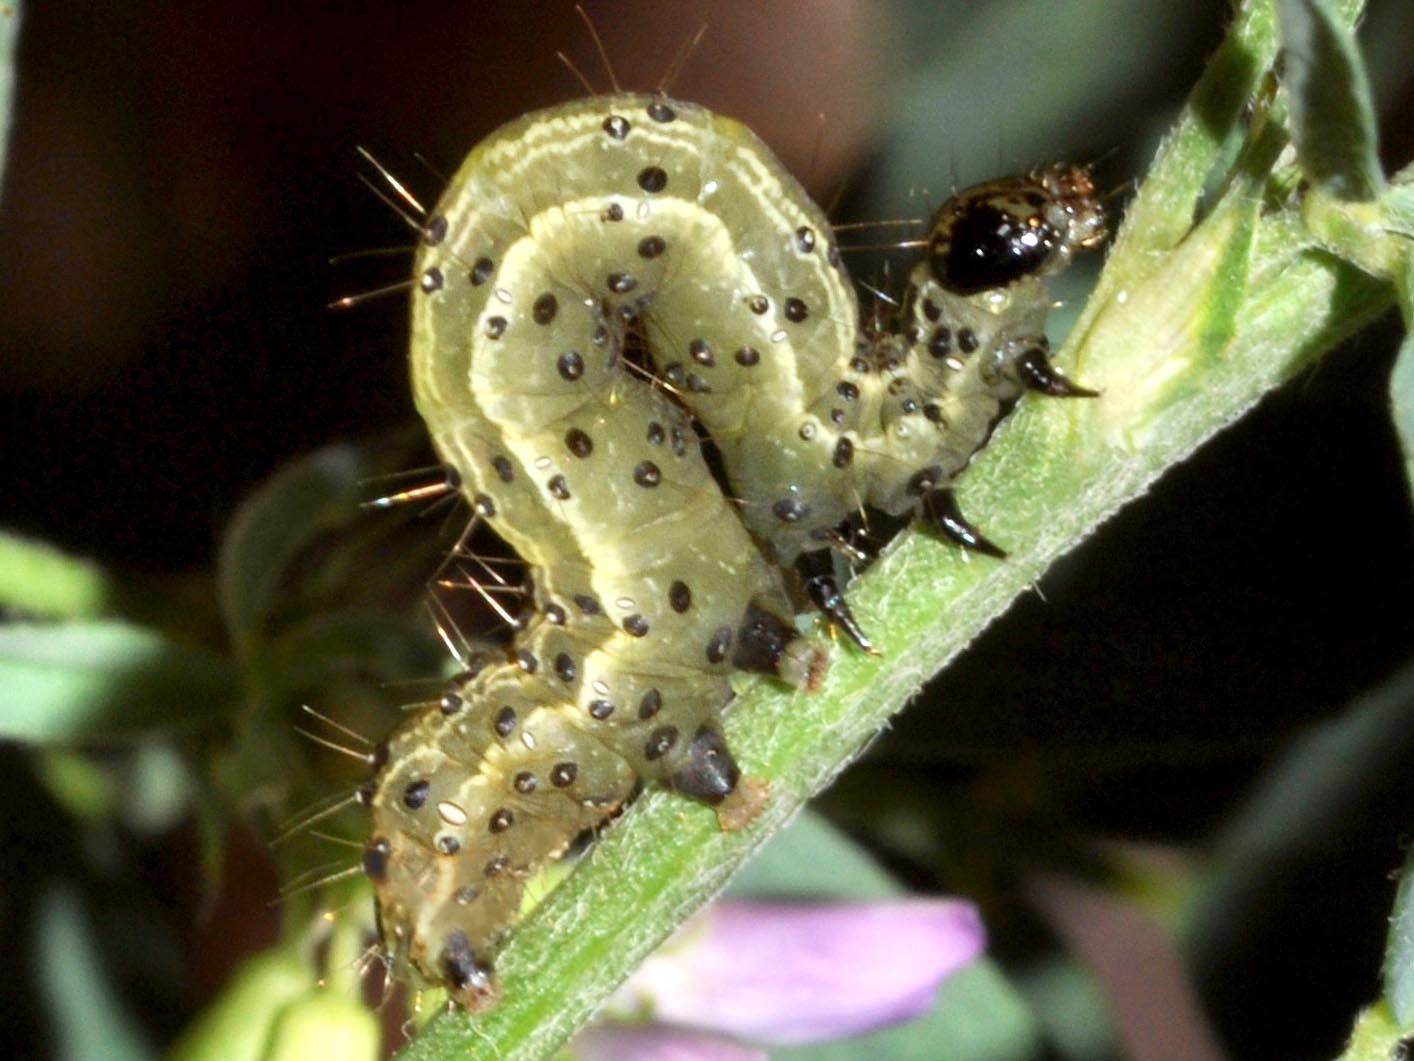 lepinet fr - Trichoplusia ni - Le Ni, la Plusie ni